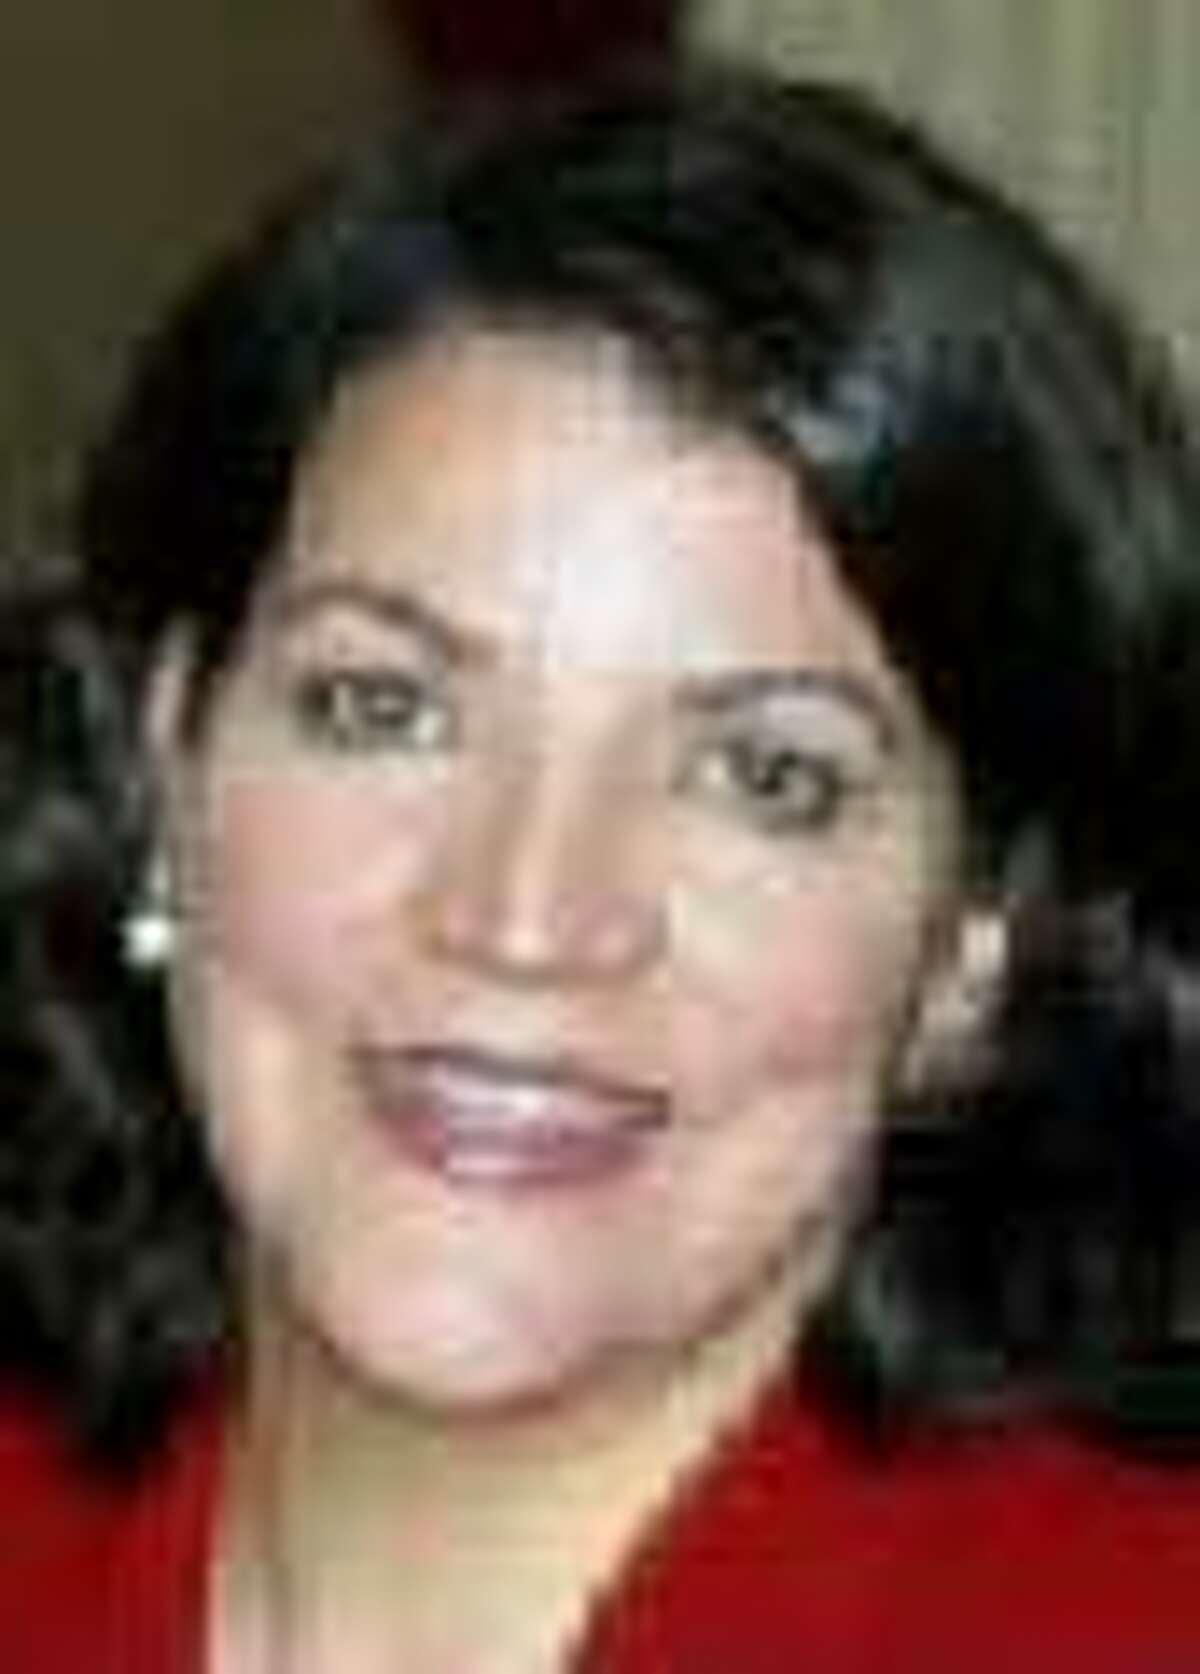 Mugshot of California State Senator, Deborah Ortiz. Handout photo. Special to The San Francisco Chronicle